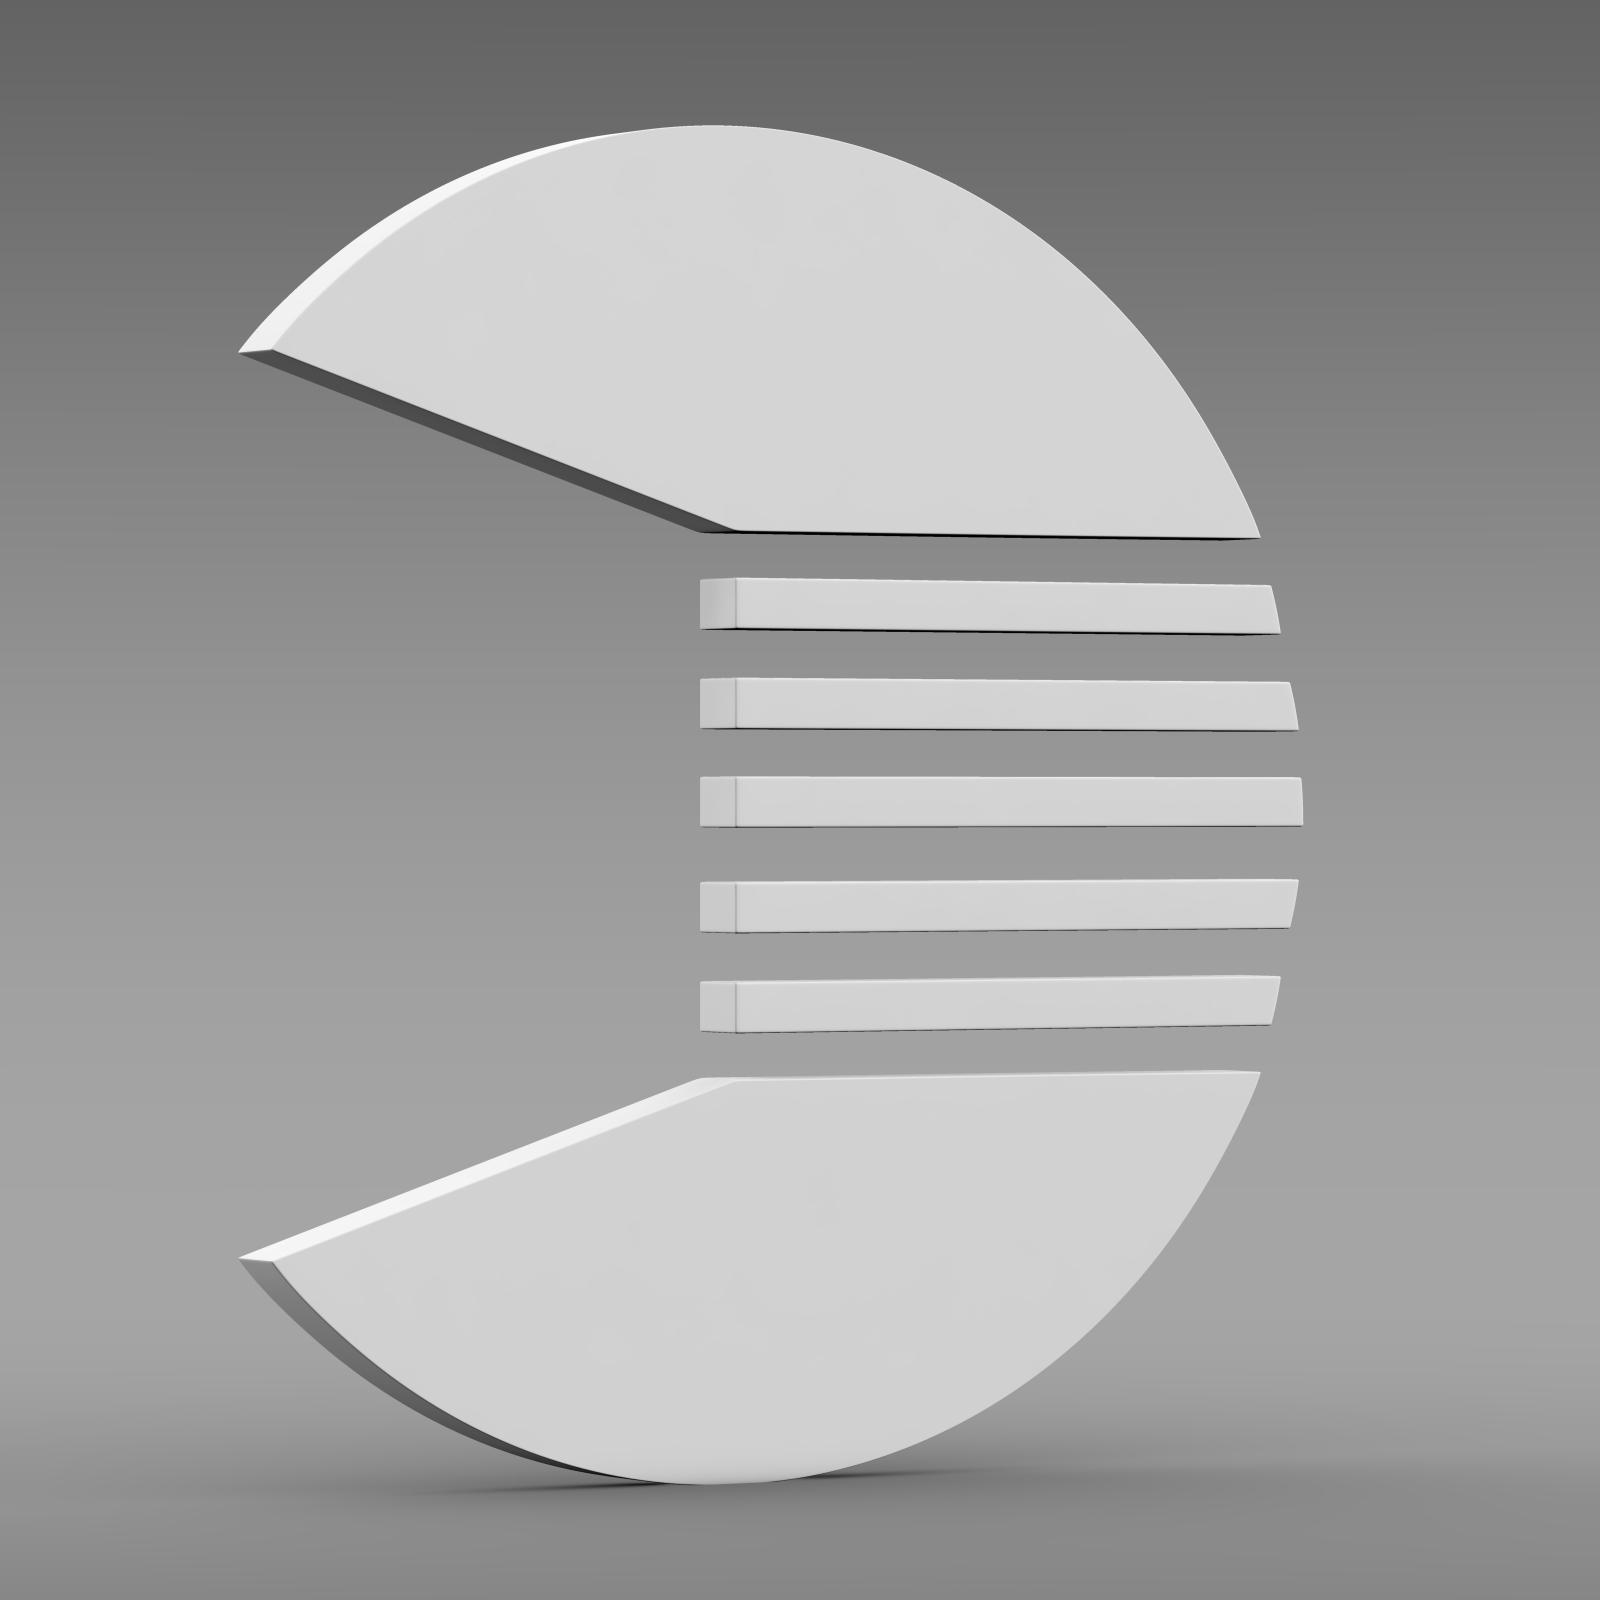 quant logo 3d model 3ds max fbx c4d lwo ma mb hrc xsi obj 213261